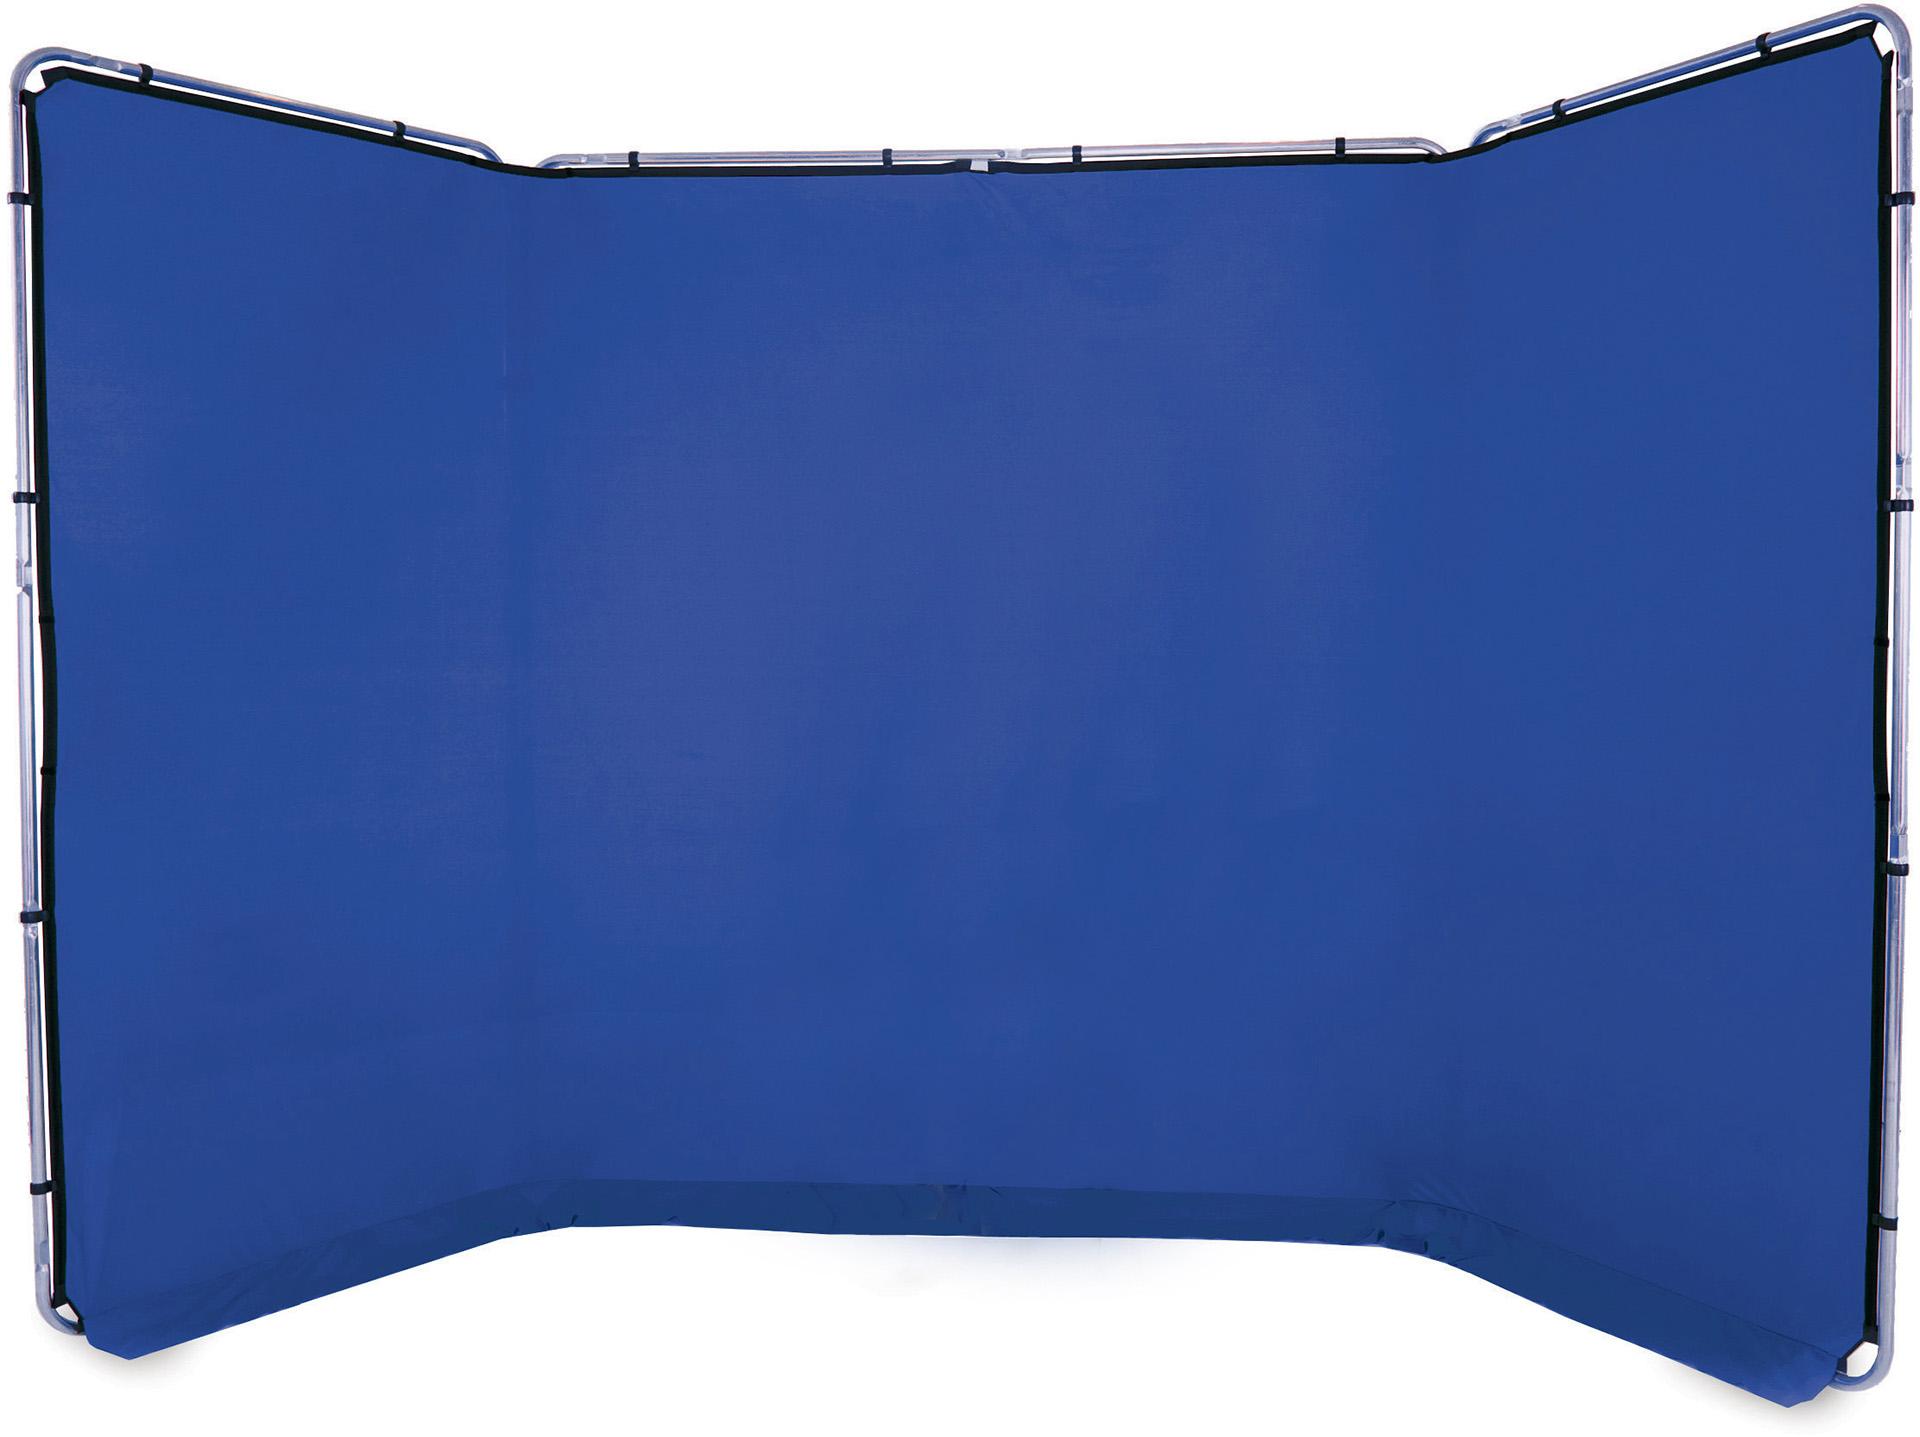 Panoramic Background 13' Chroma Key Blue